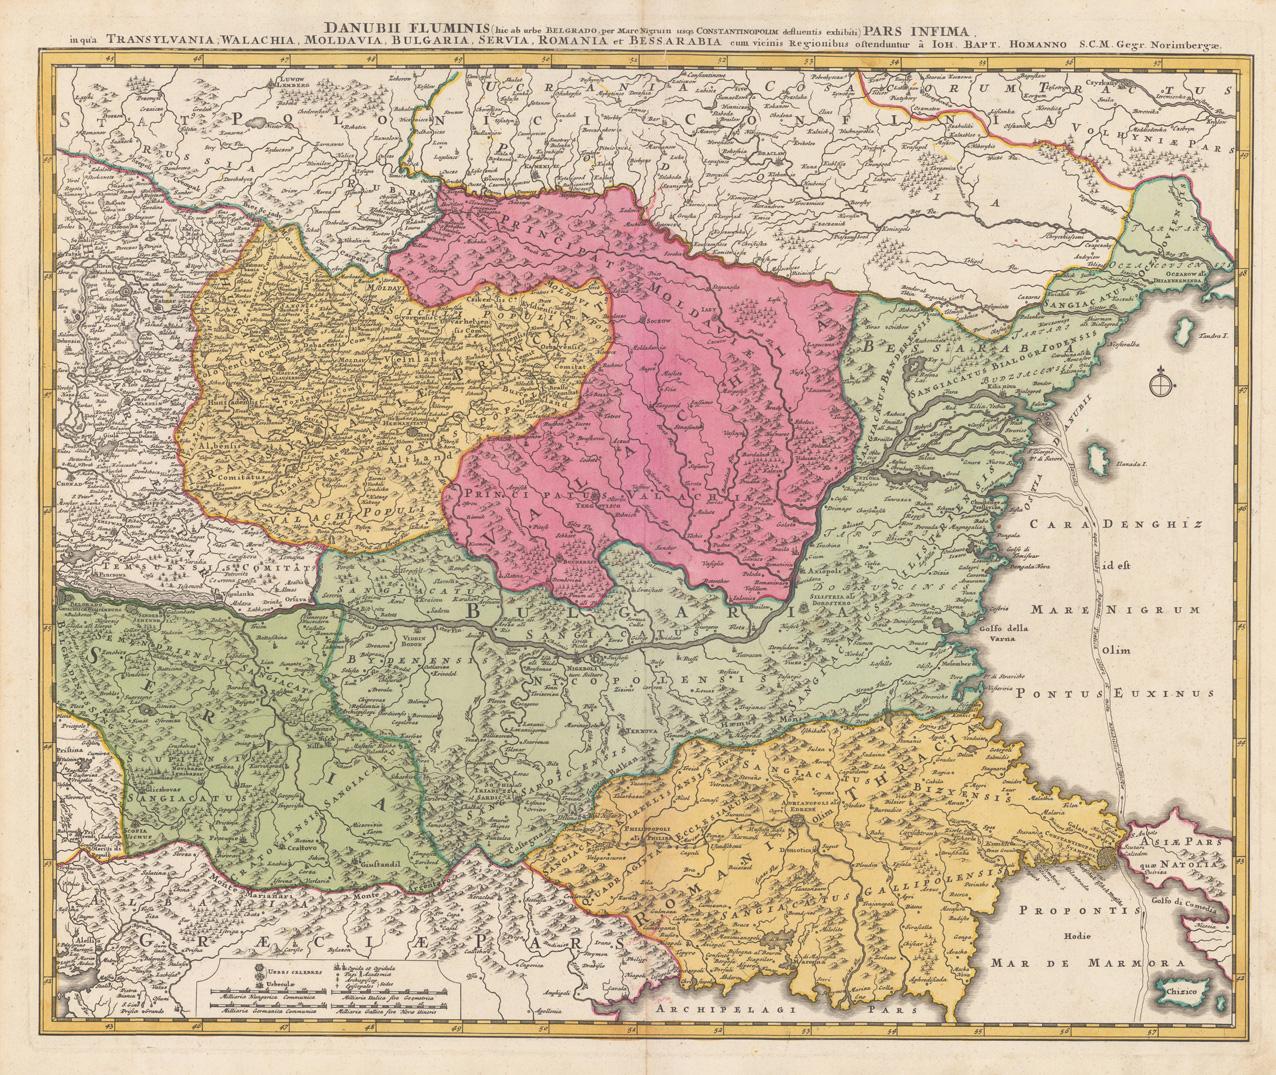 Maps With Transylvania And Romania